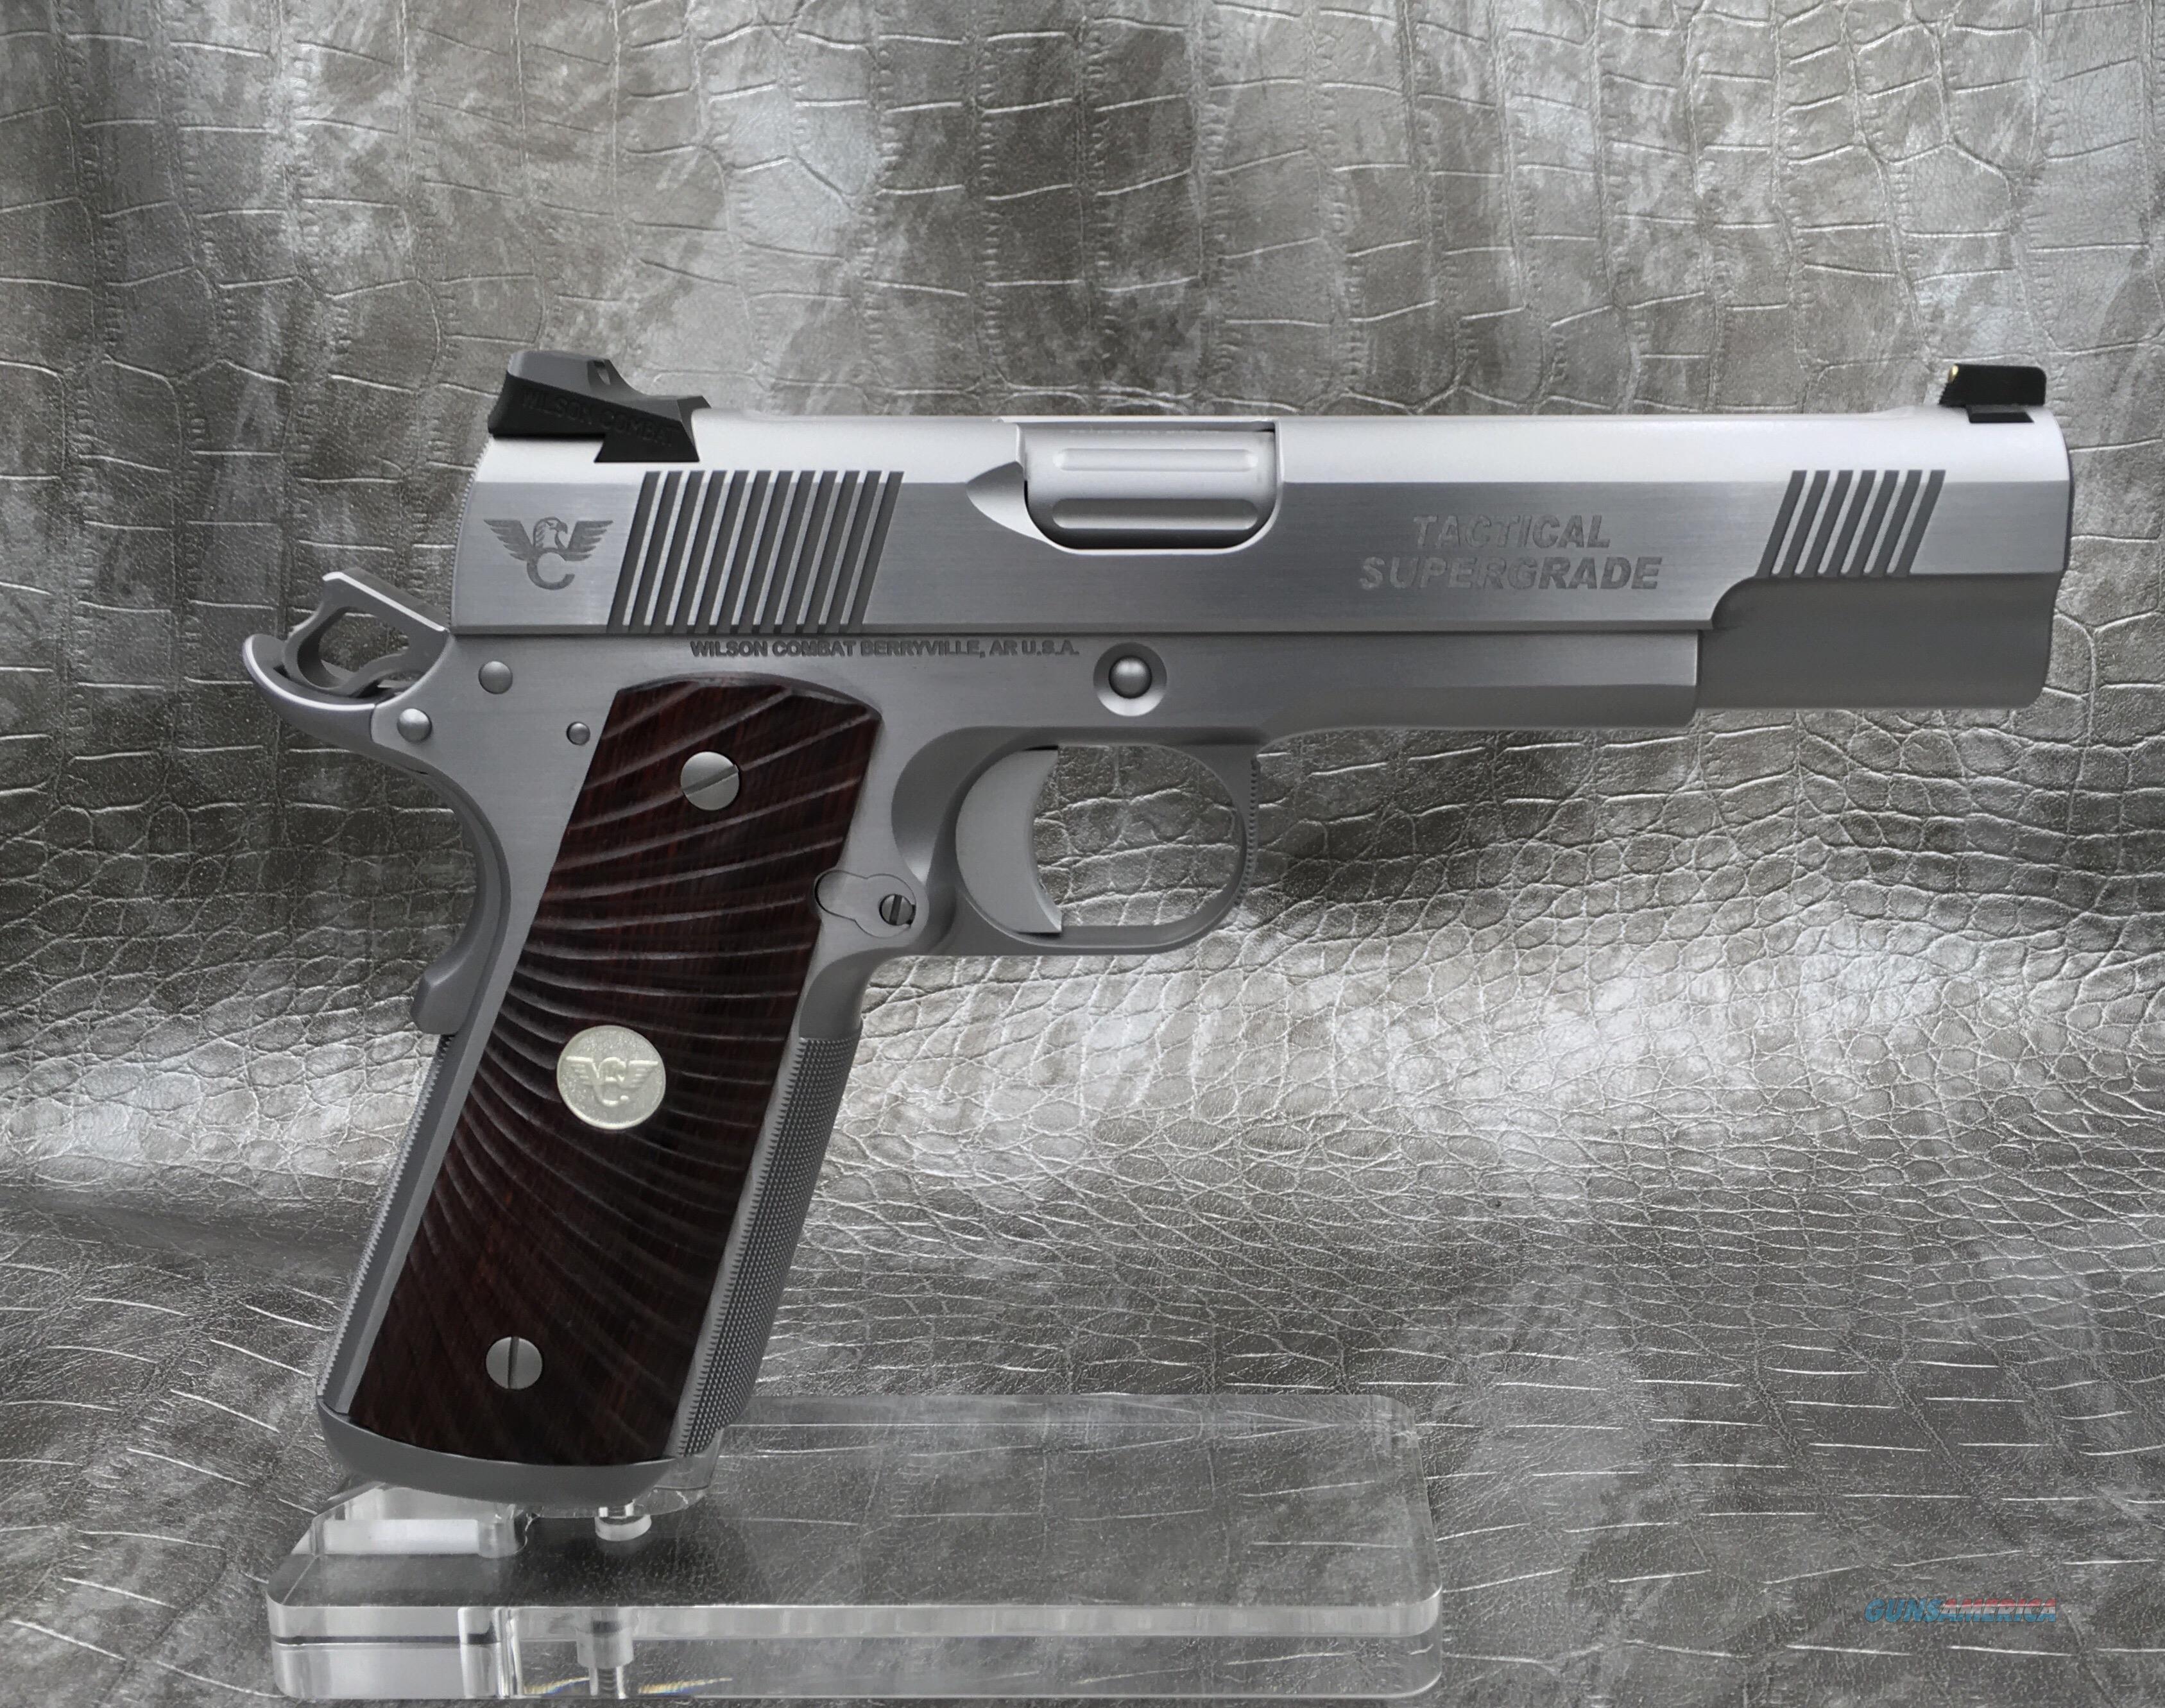 Wilson Combat Tactical Supergrade 9MM -ALL StAINLESS STEEL  Guns > Pistols > Wilson Combat Pistols